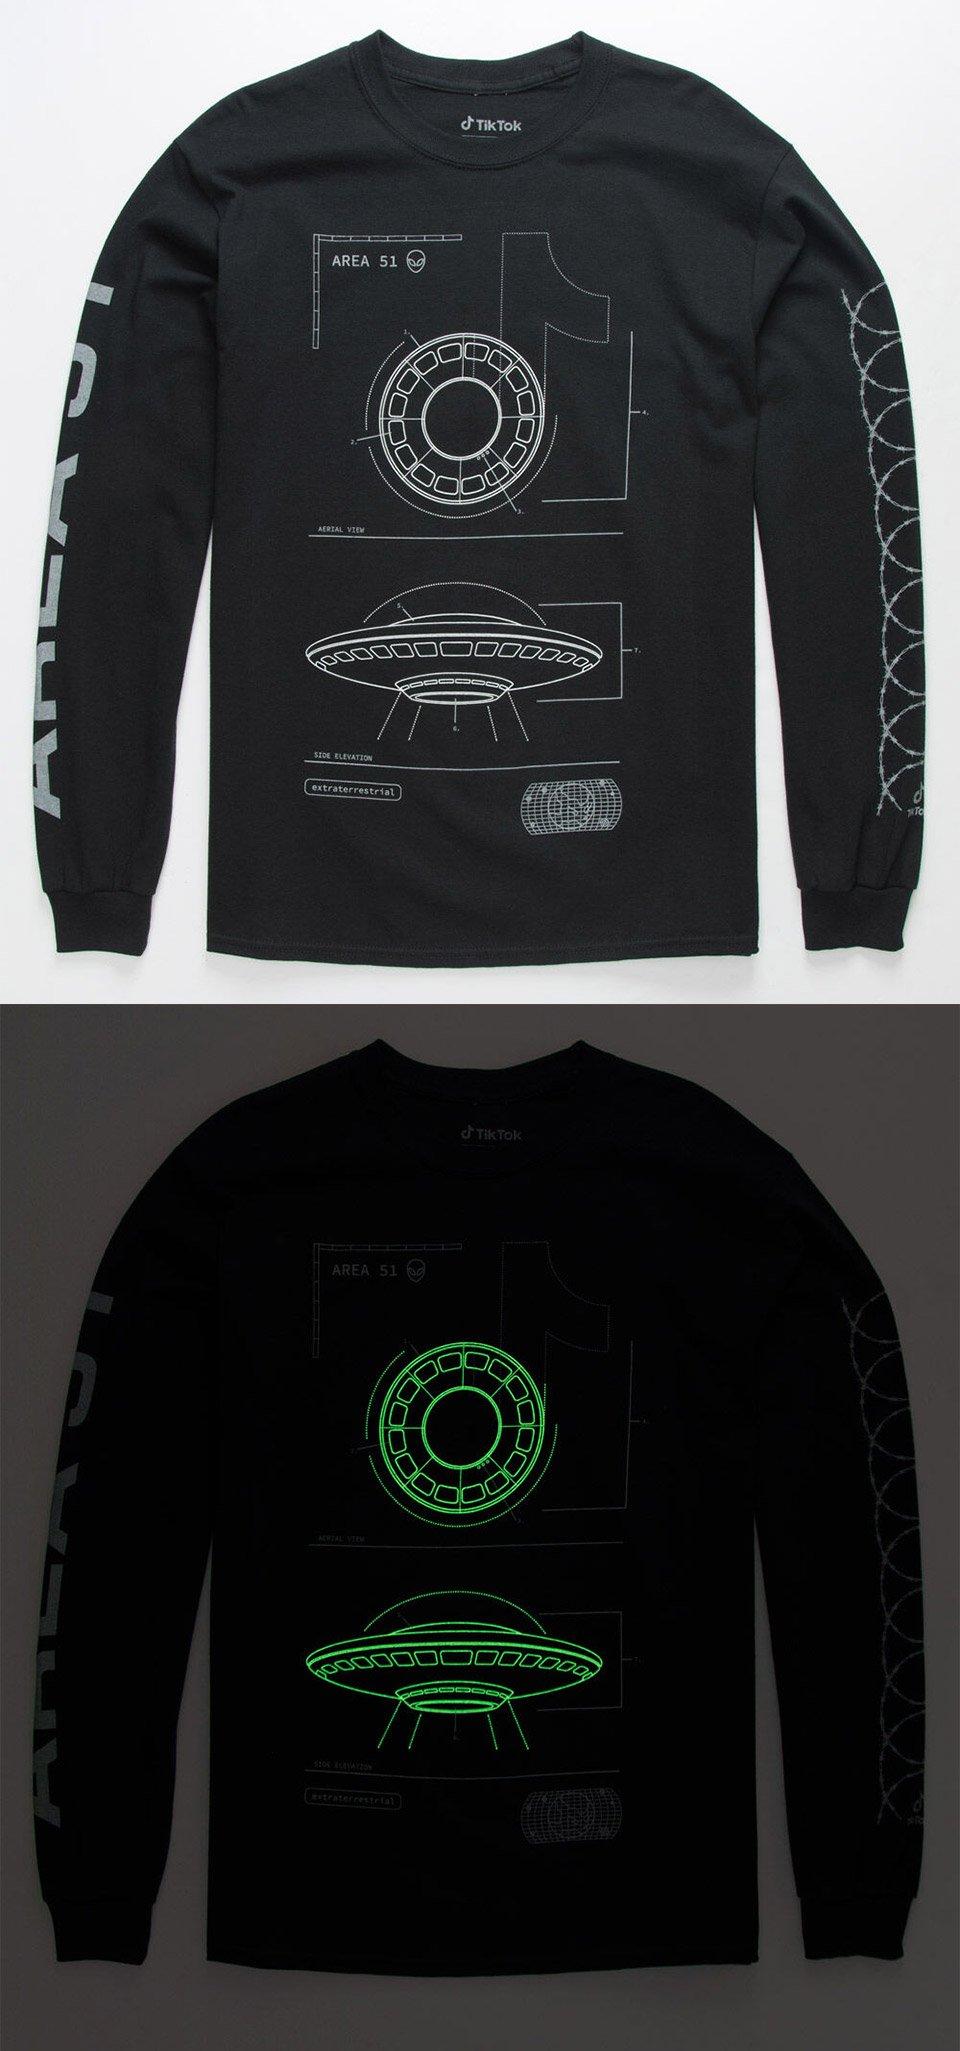 TikTok x Area 51